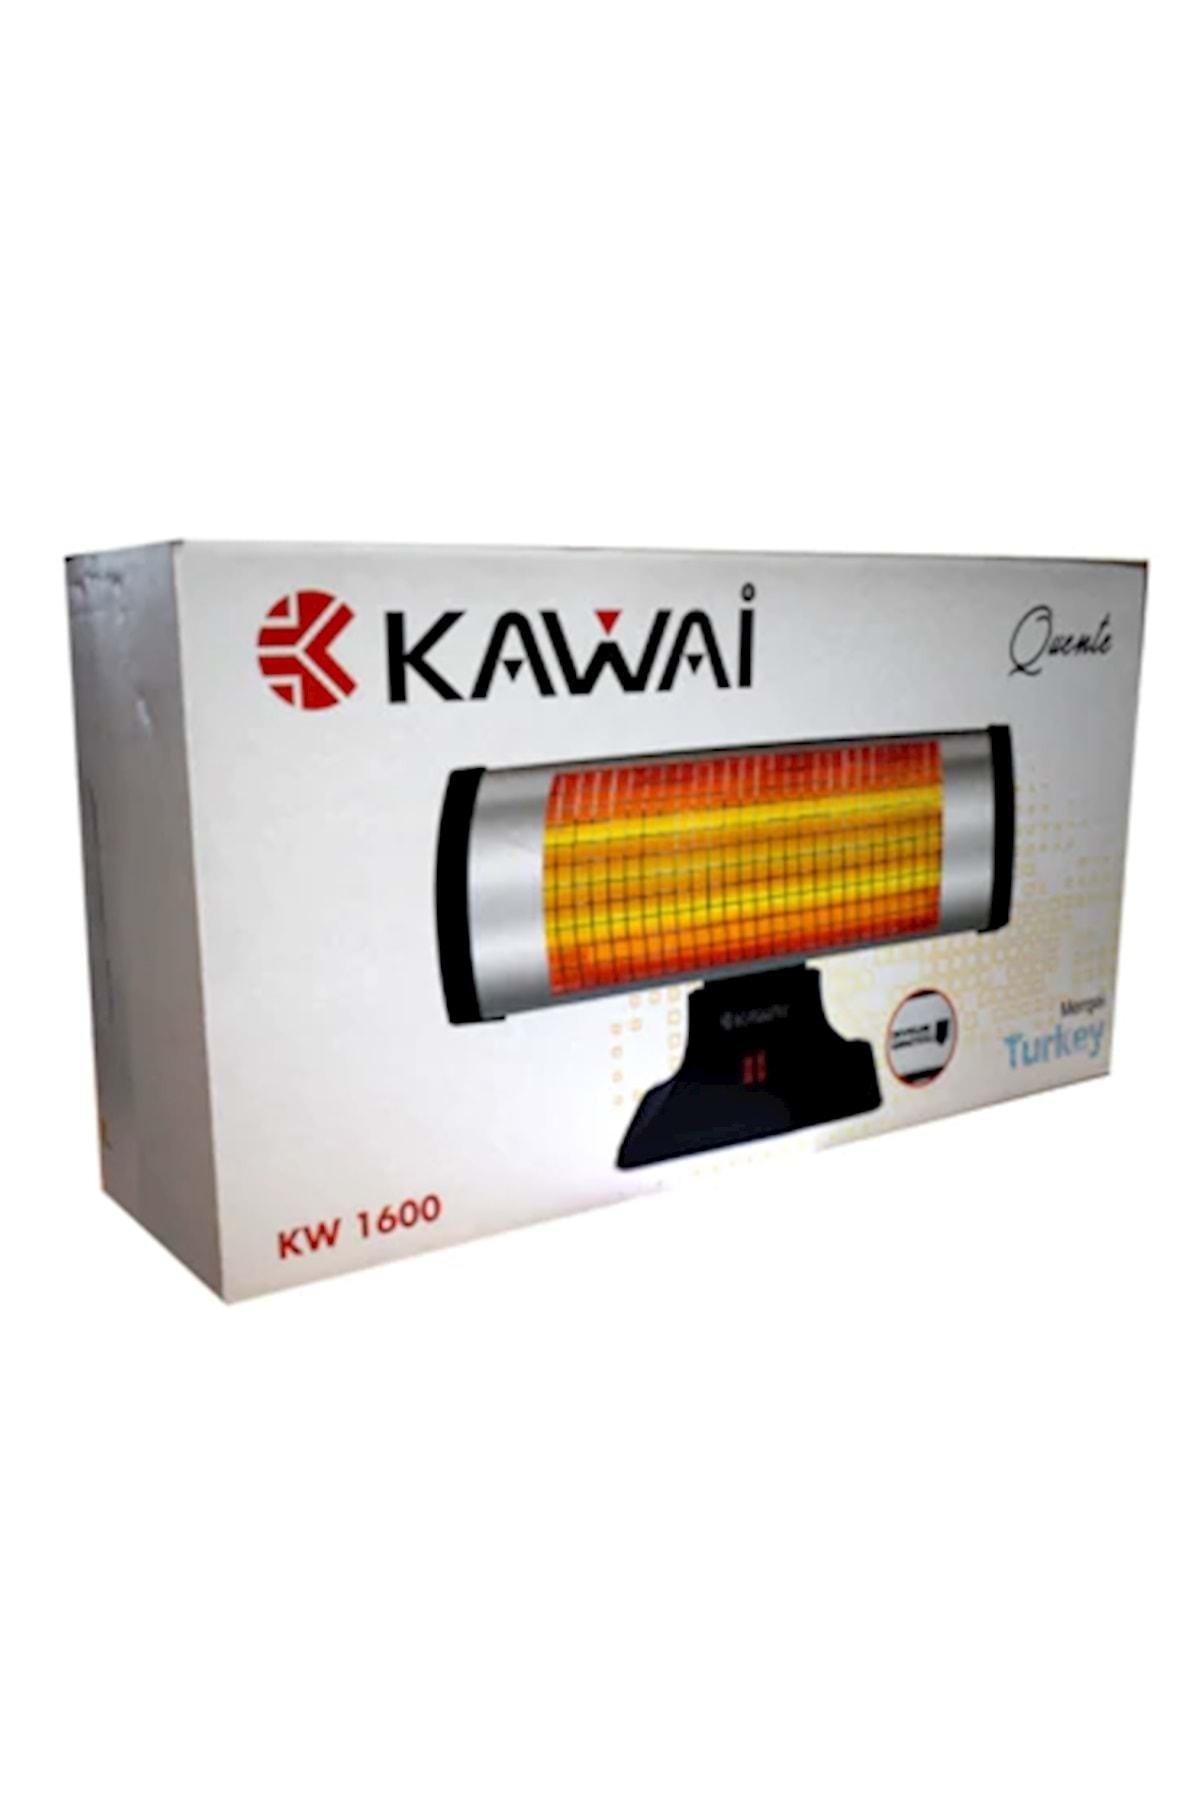 Kawai Kw-1600w 2 Çubuk Elektrikli Soba Isıtıcı Devrilme Emniyet Düğmel 2